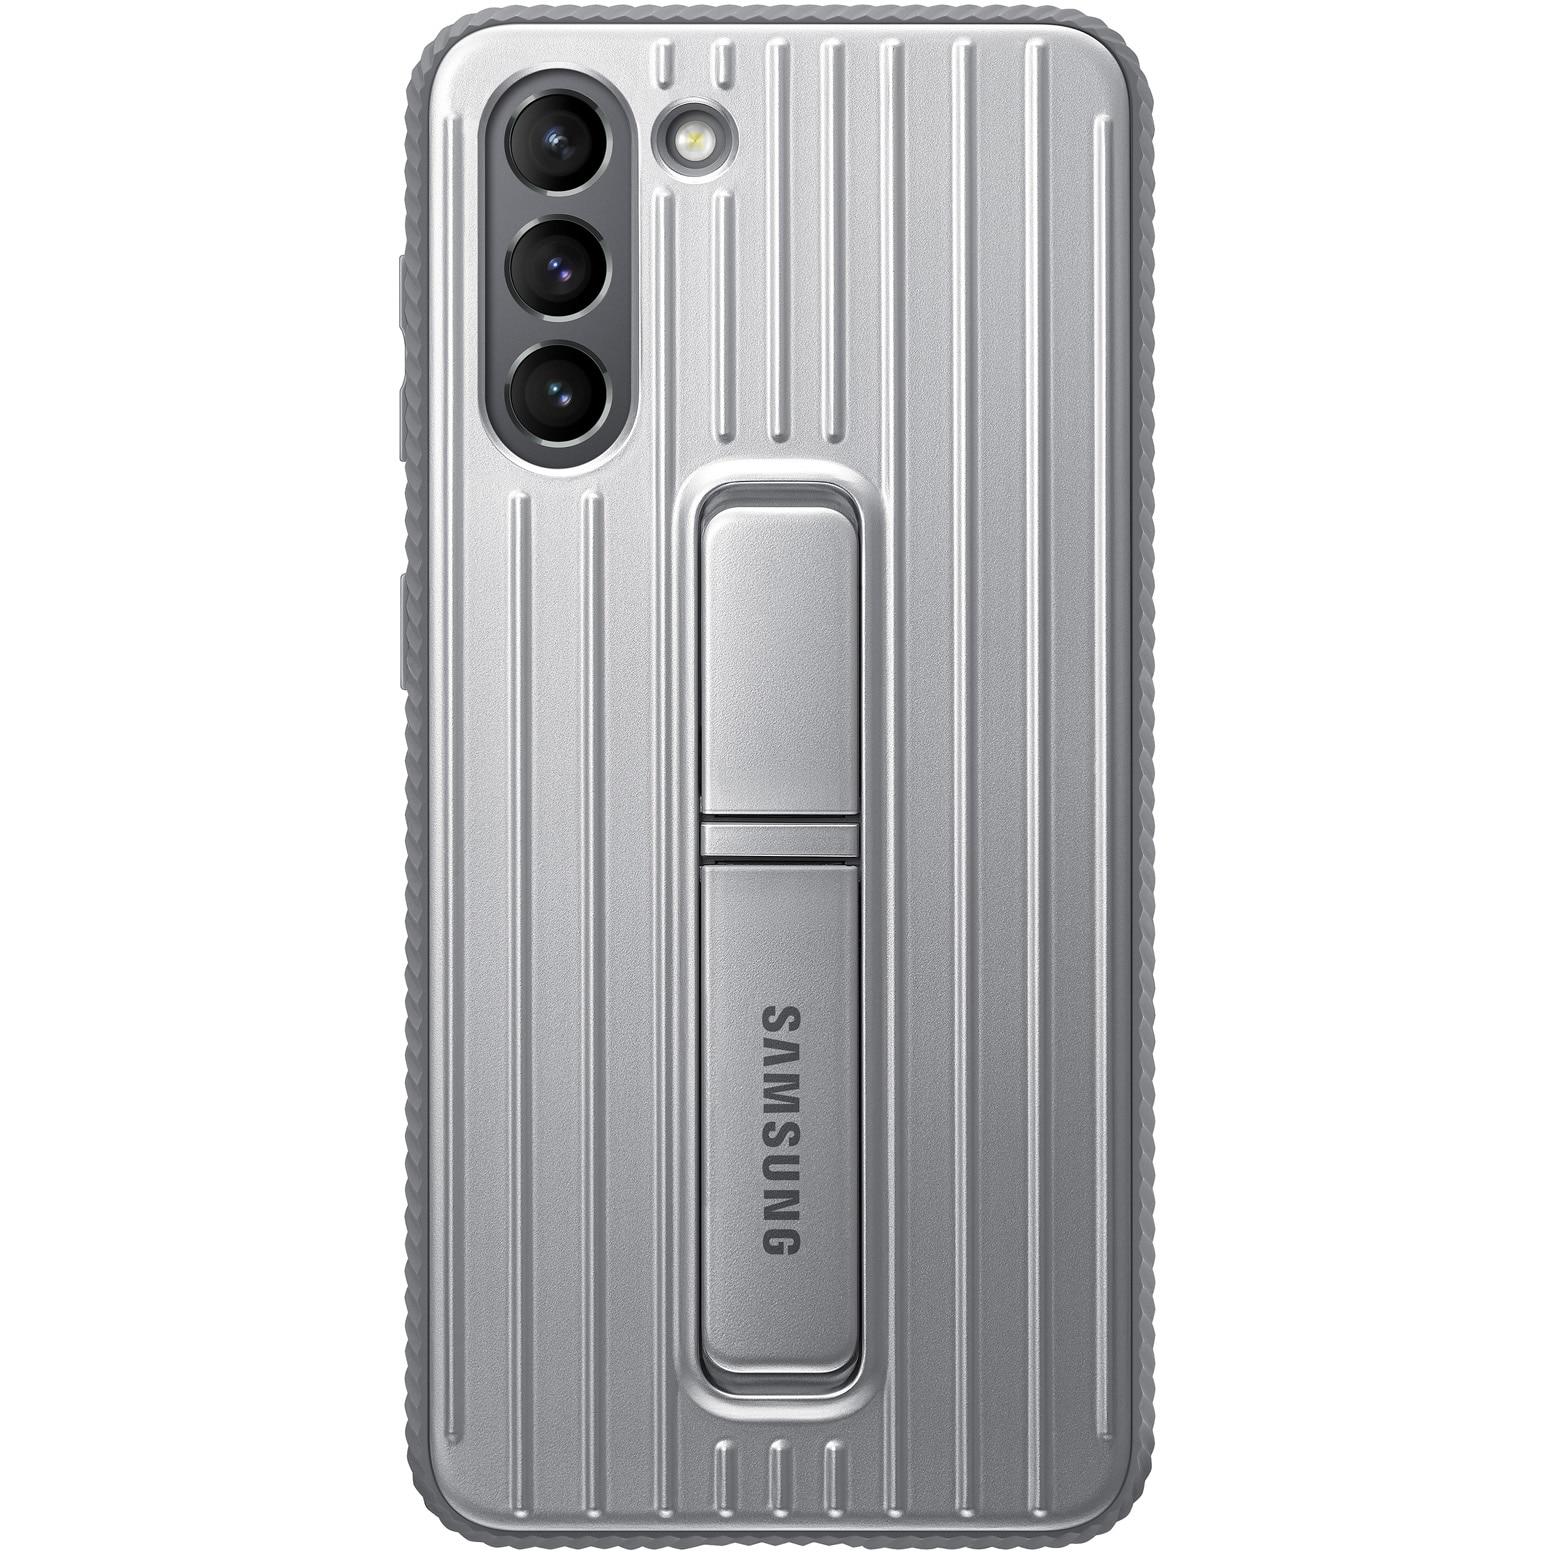 Fotografie Husa de protectie Samsung Protective Standing Cover pentru Galaxy S21, Light Gray